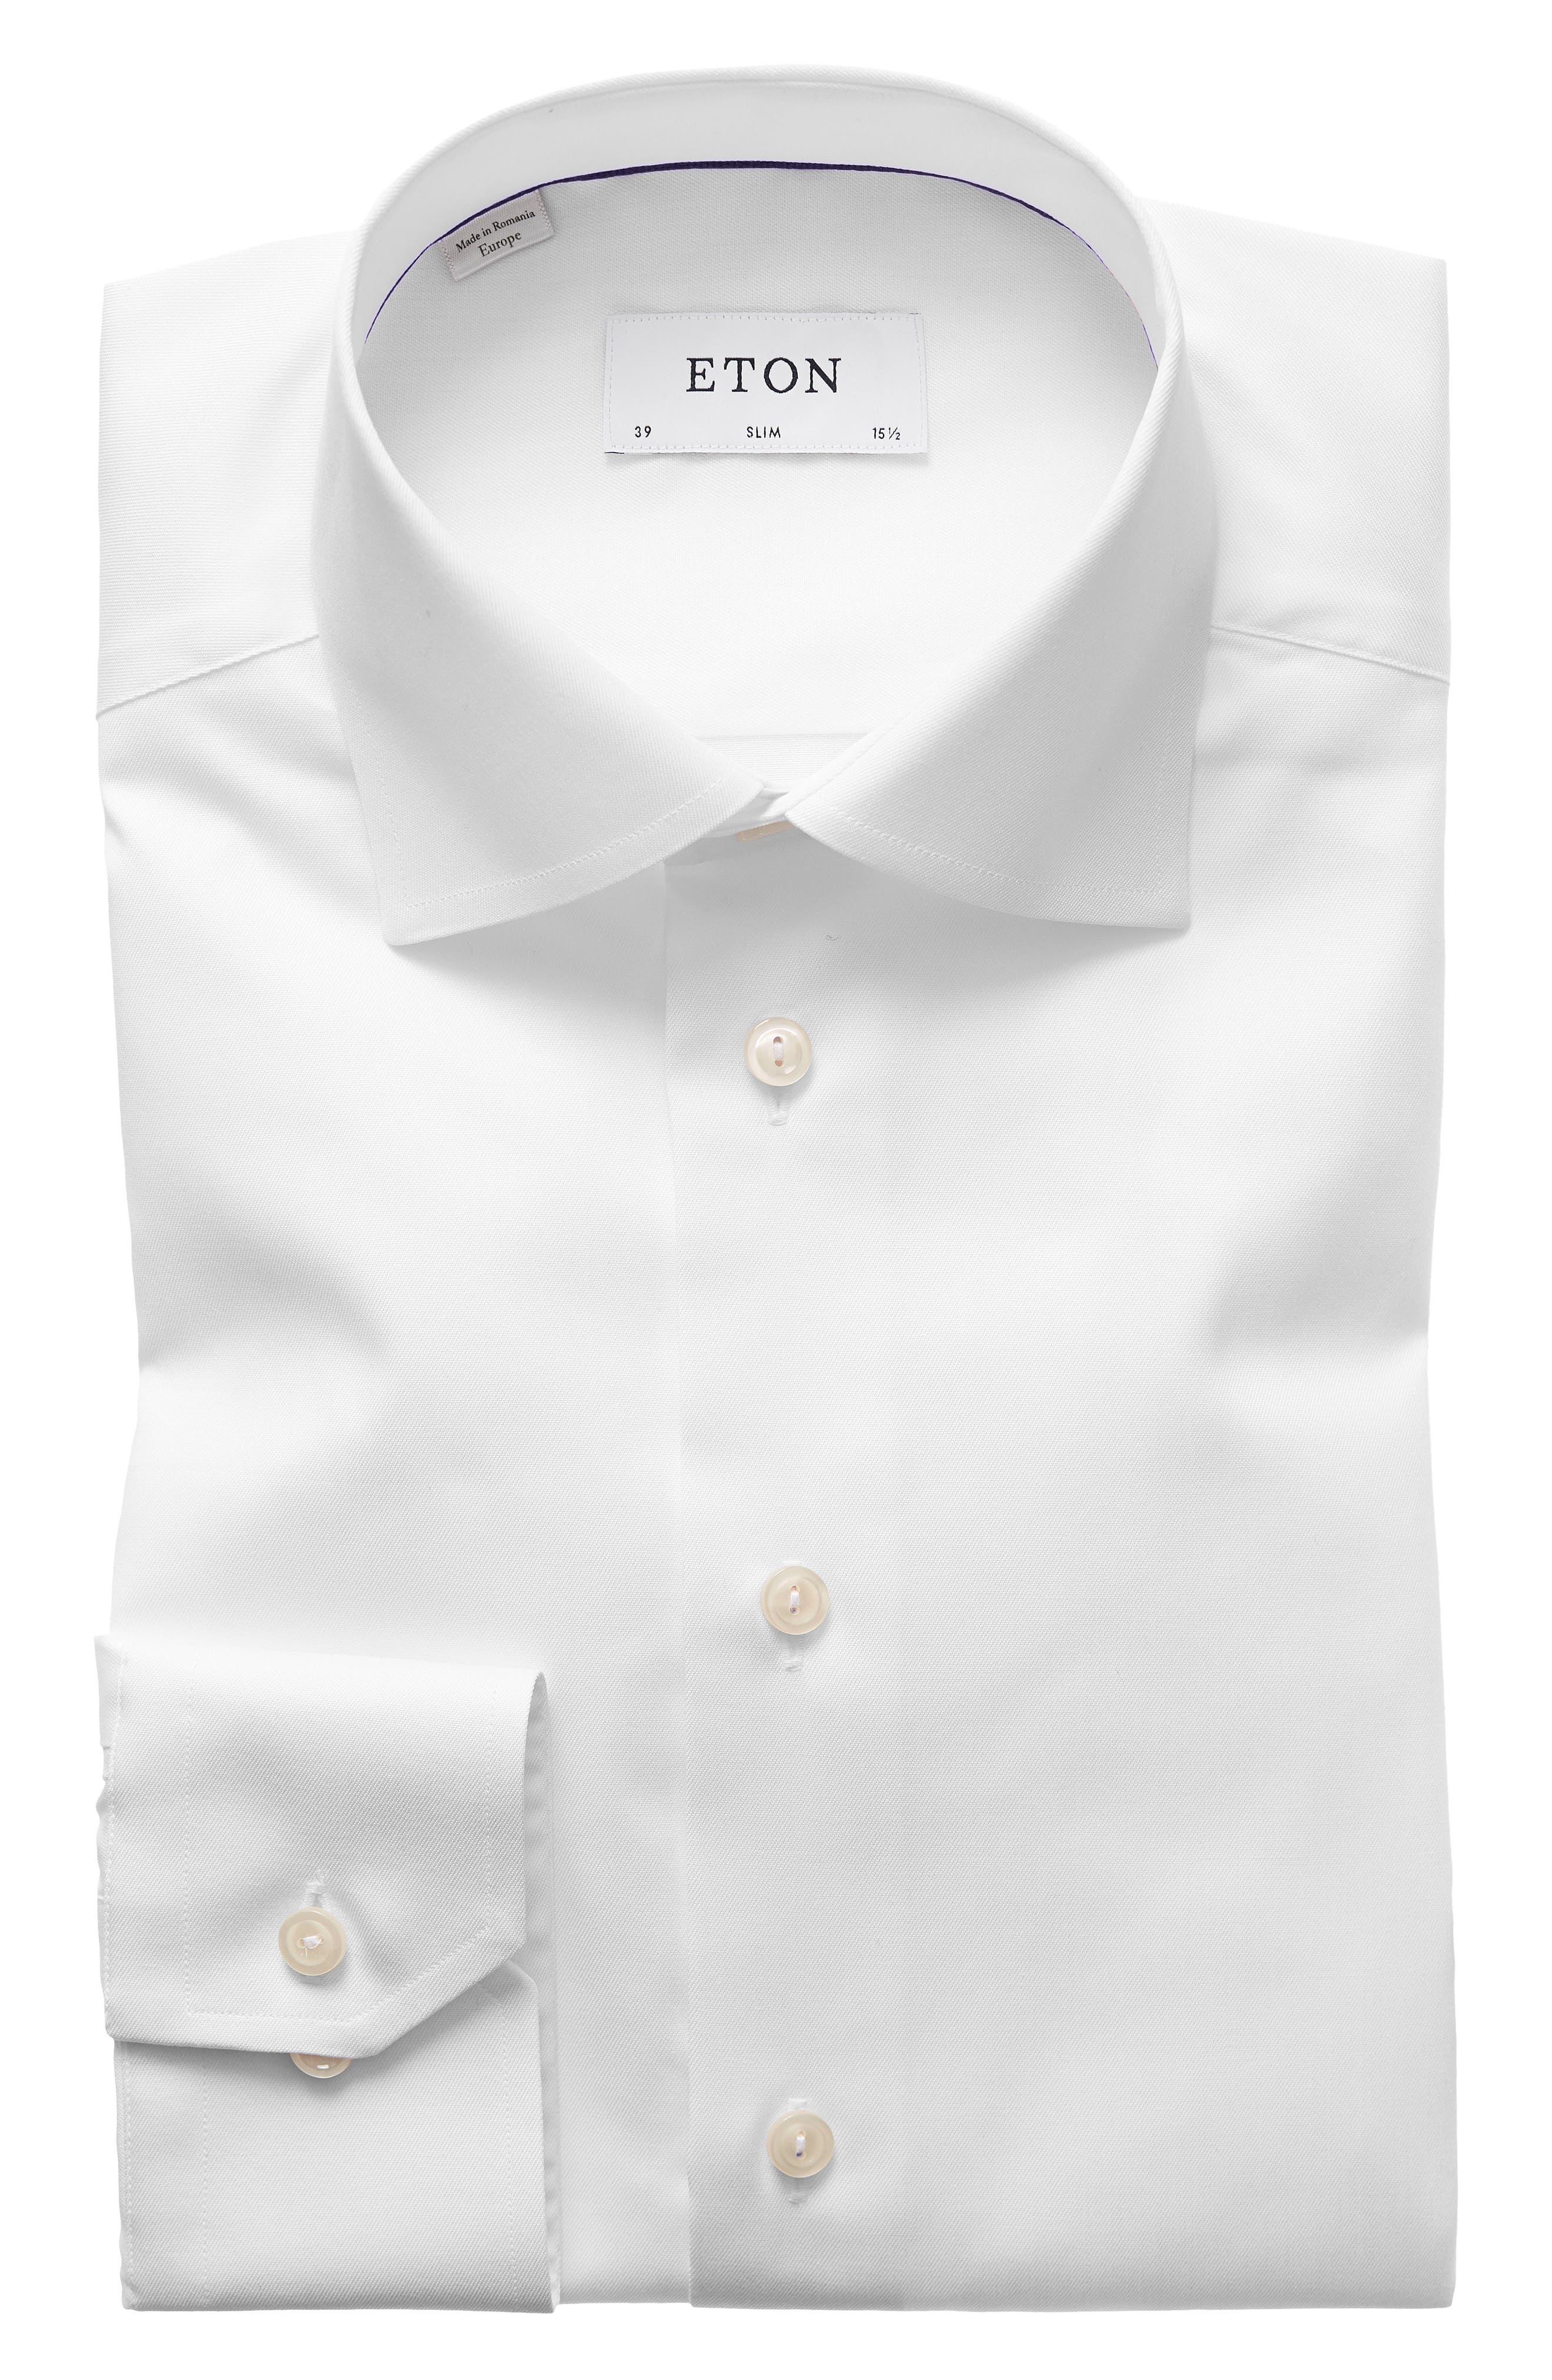 ETON Slim Fit Twill Dress Shirt, Main, color, WHITE